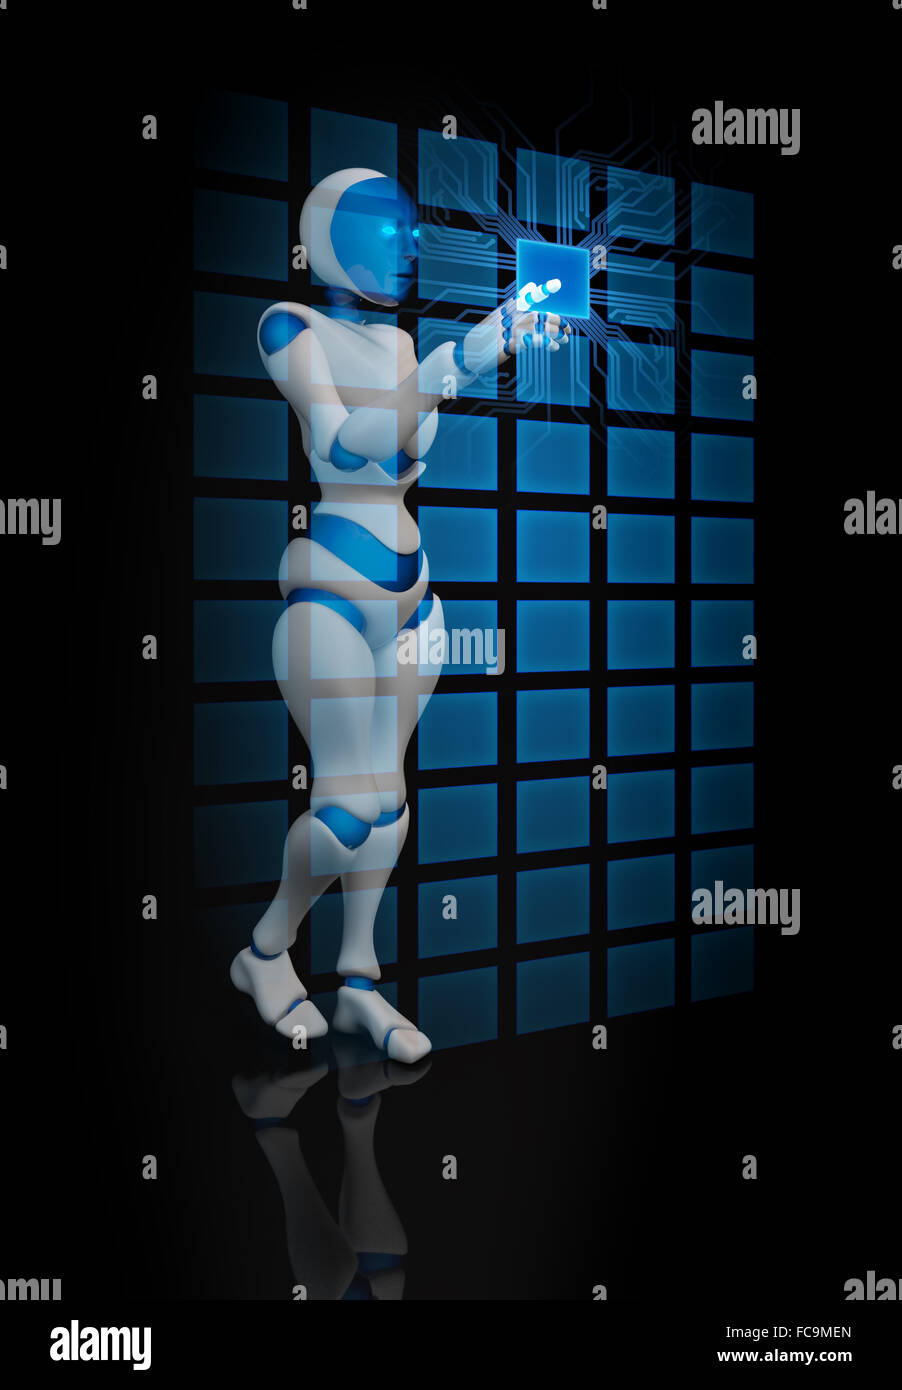 Humanoid female robot using a futuristic interface - Stock Image